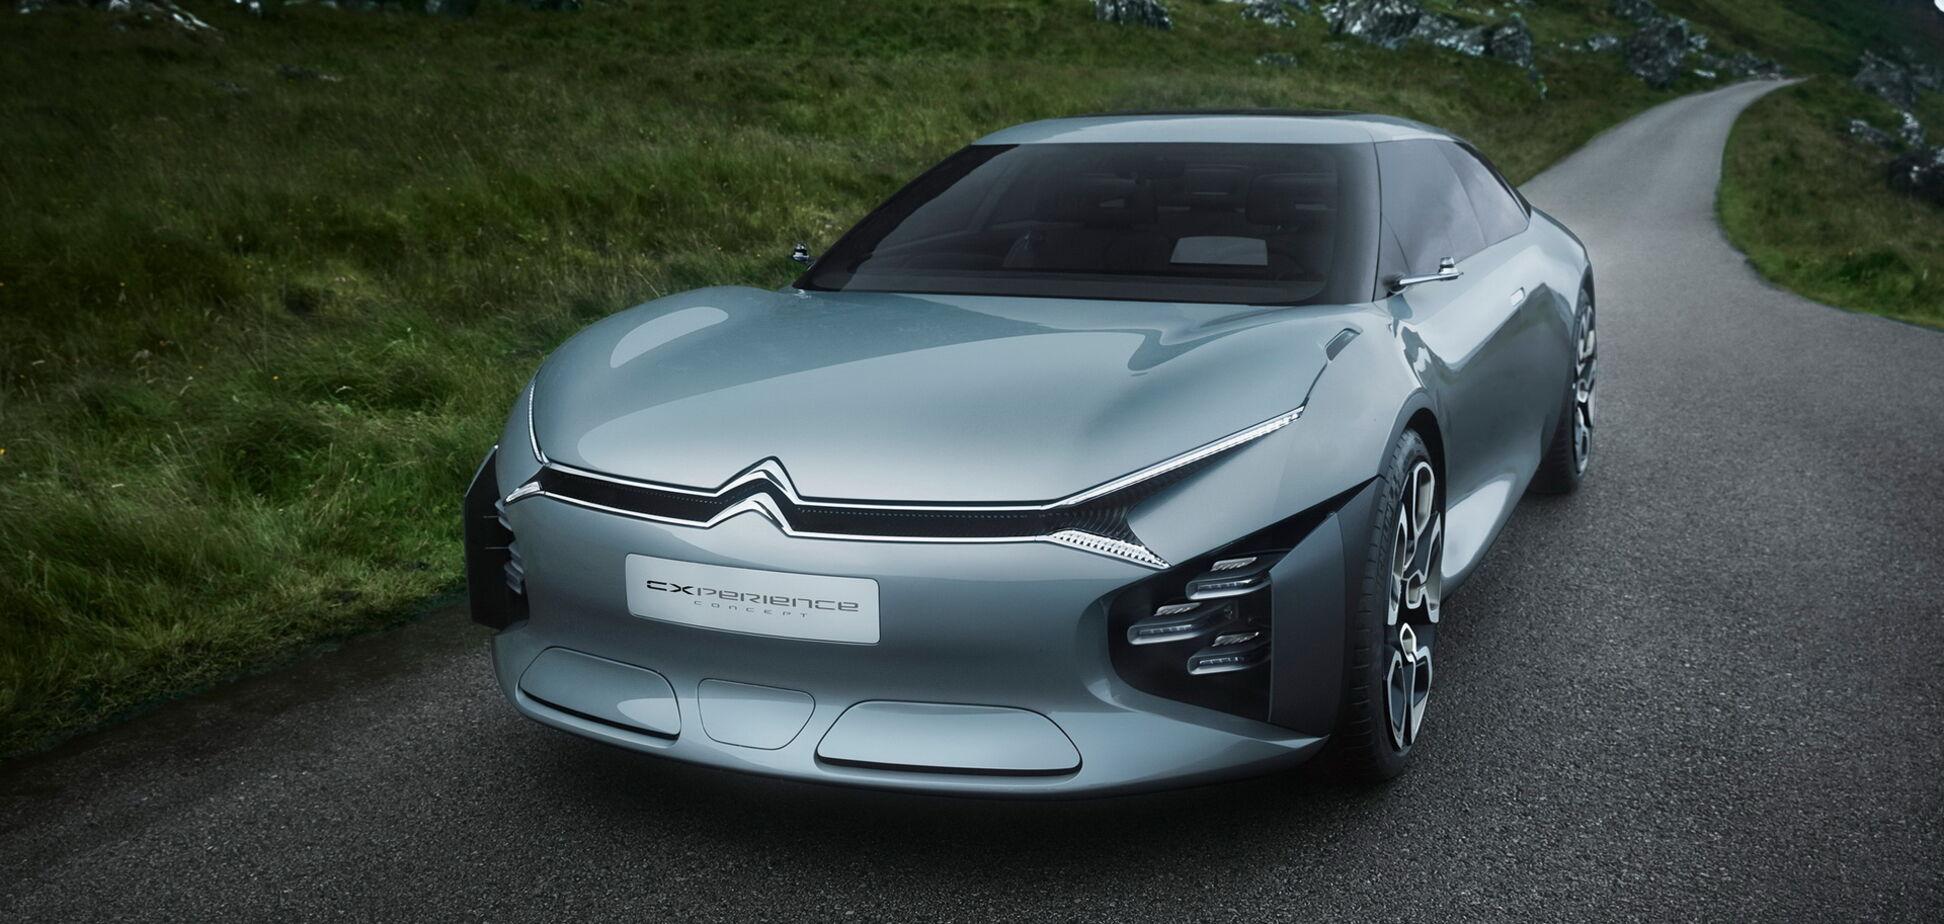 Citroen готовит наследника модели C5